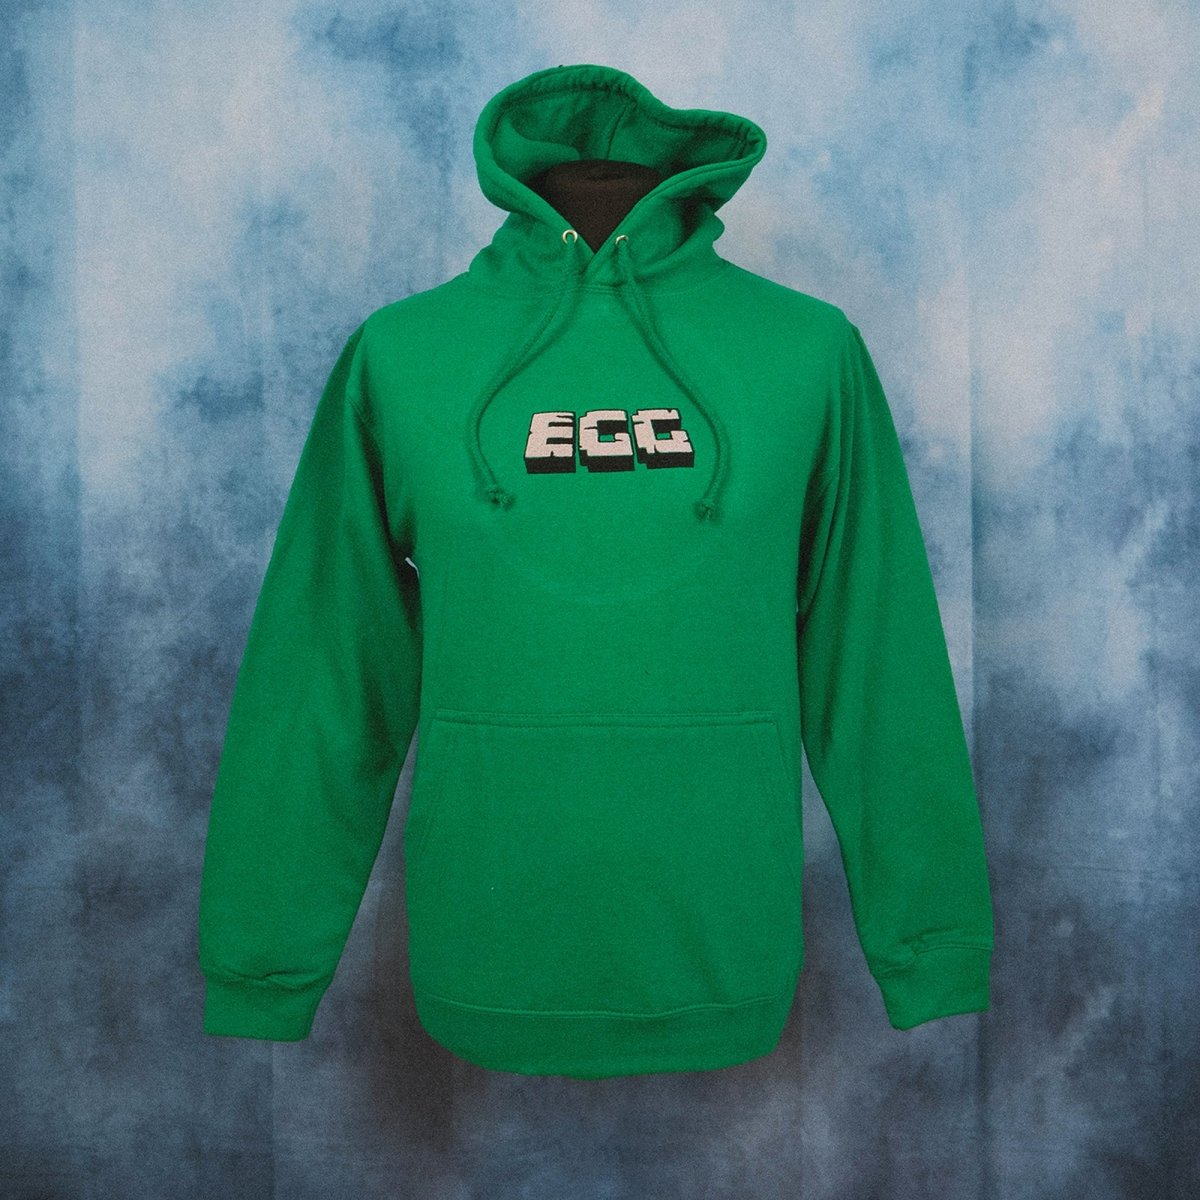 Epic Gamer Grandma - Minecraft EGG Green Embroidered Hoodie